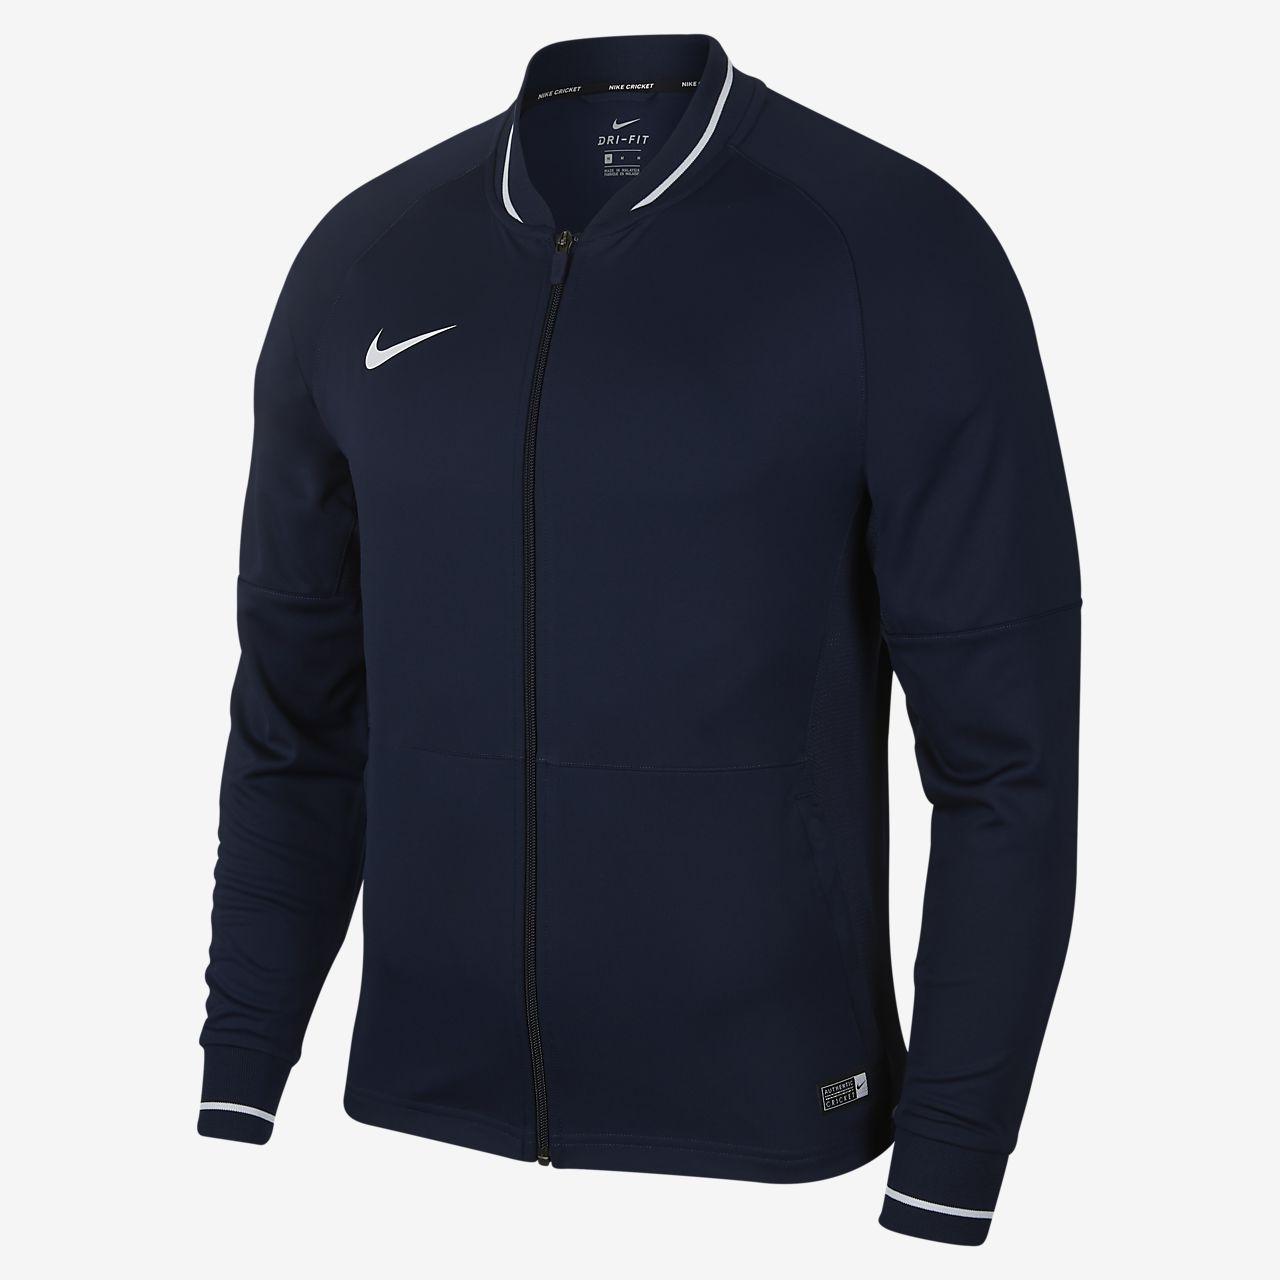 c4bfd191 Nike Dri-FIT Men's Full-Zip Cricket Jacket. Nike.com IN